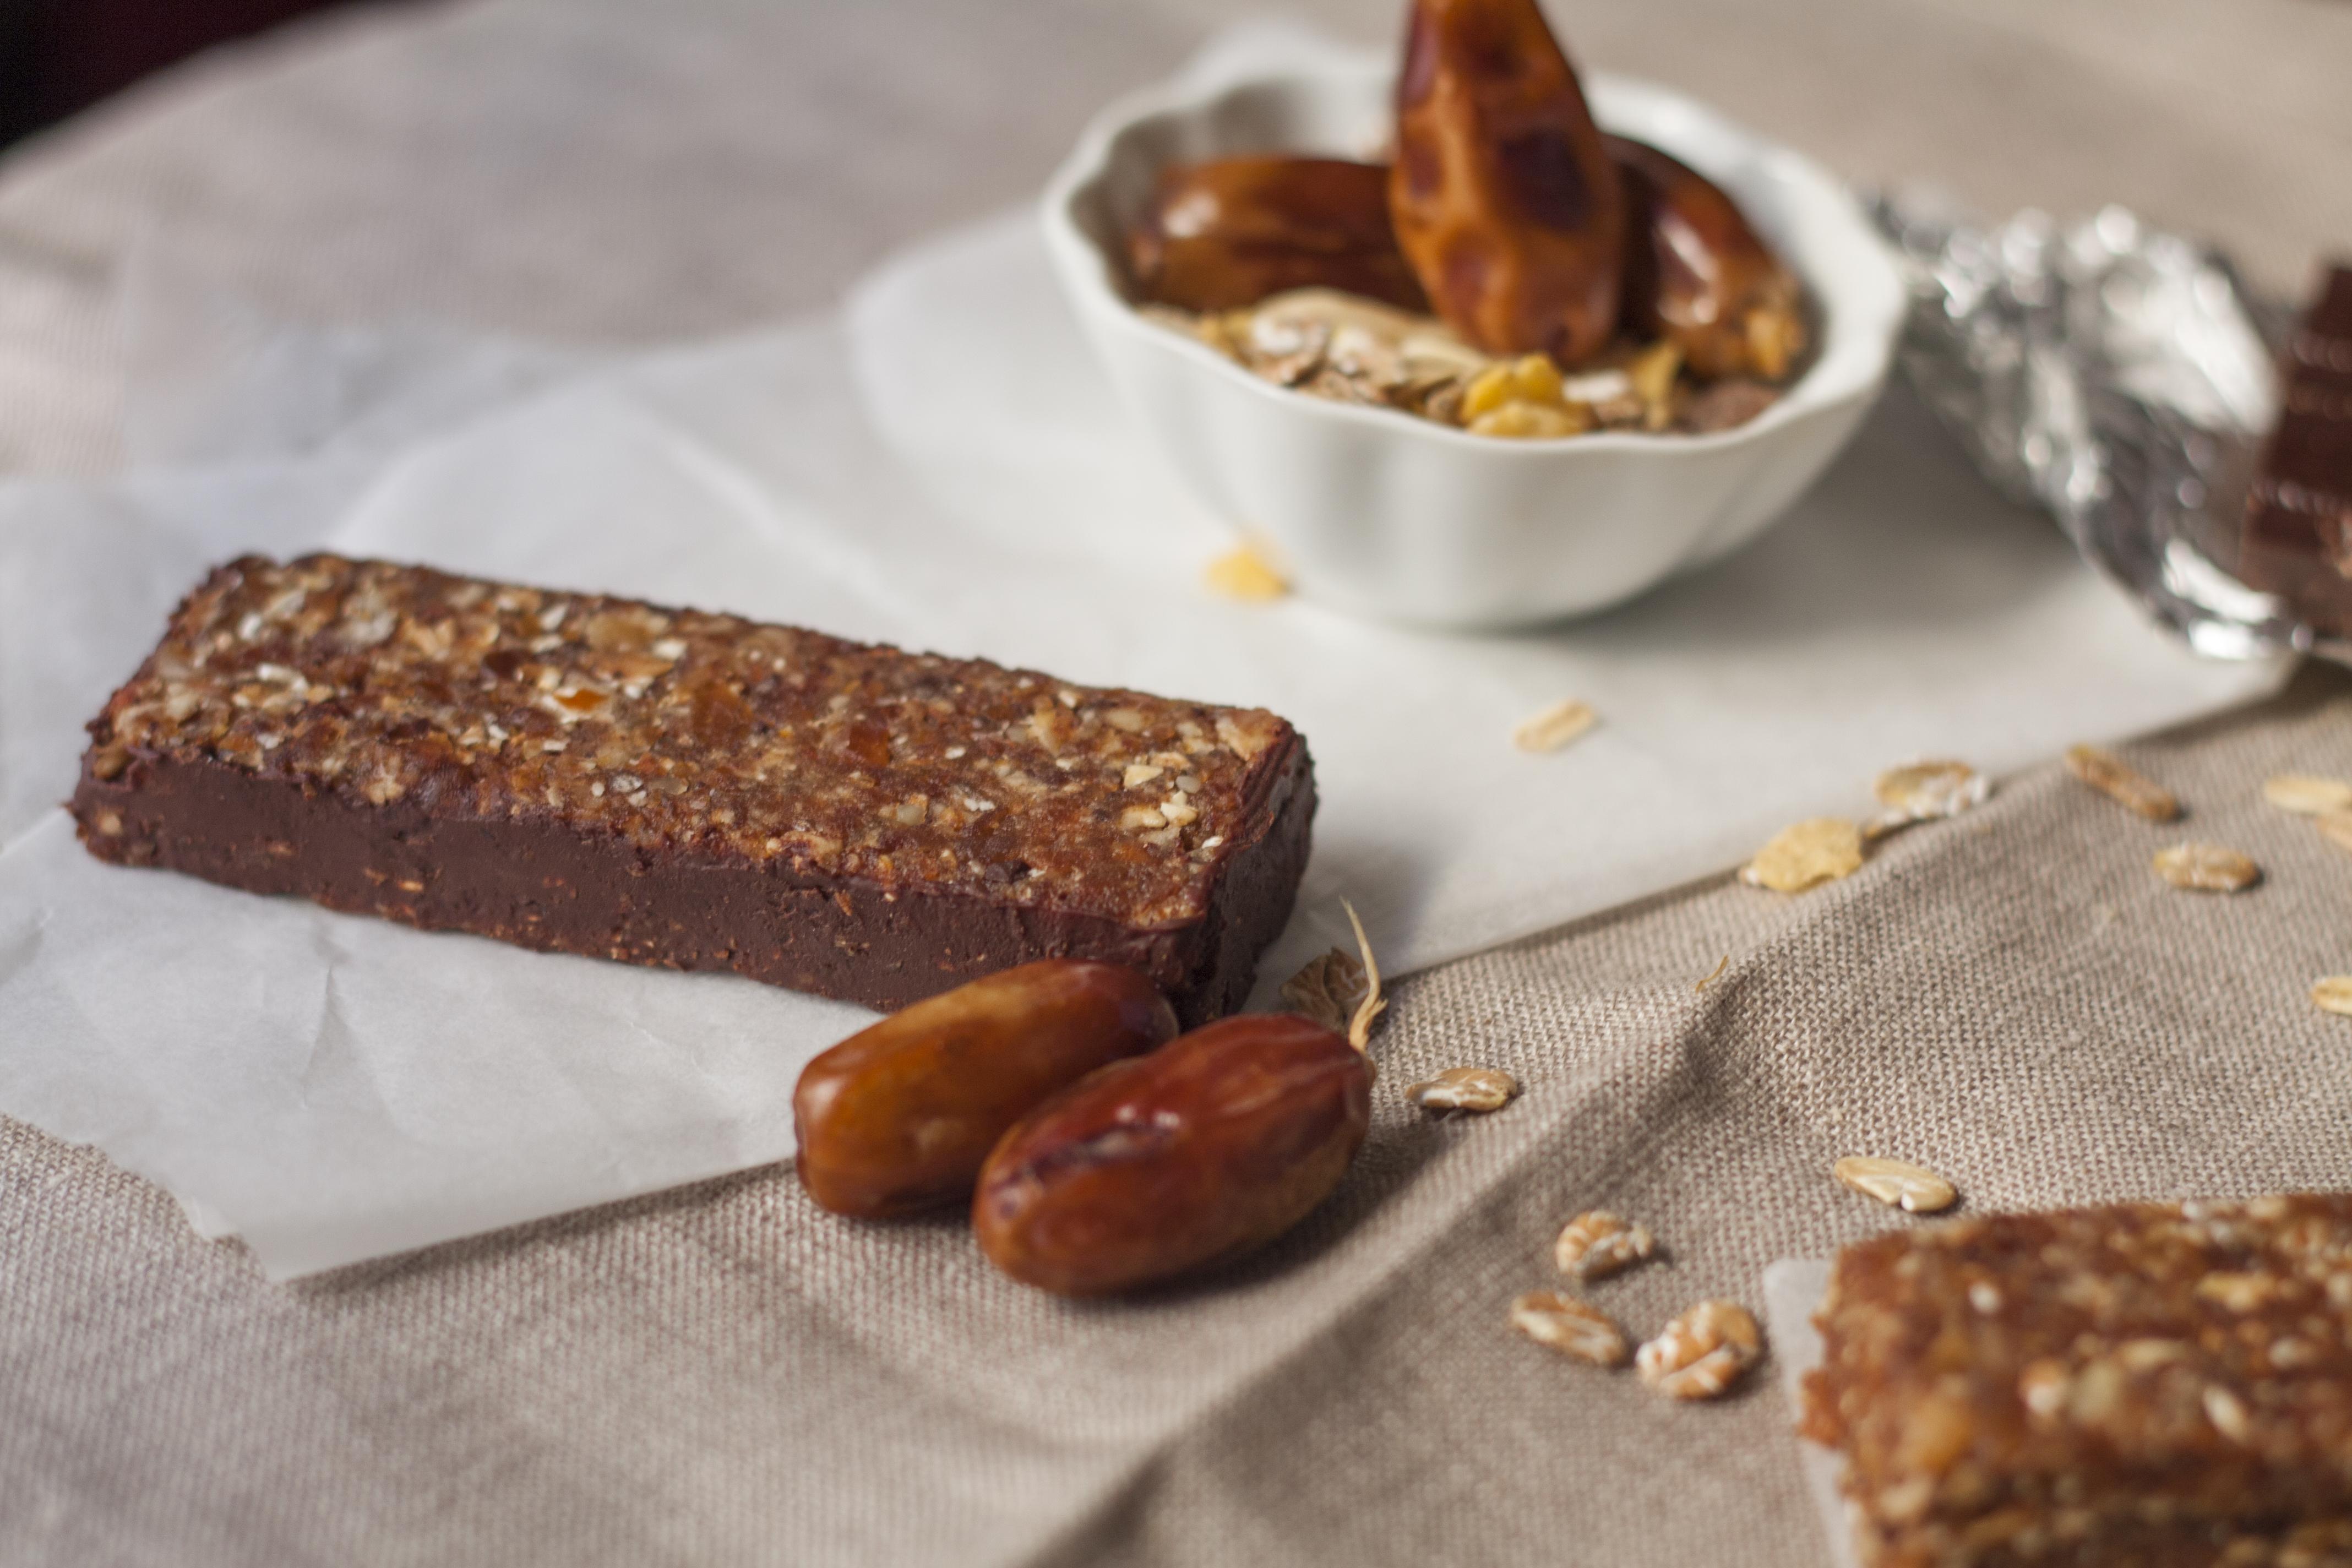 la-cuchara-azul-barritas-cereales-muesli-chocolate-2